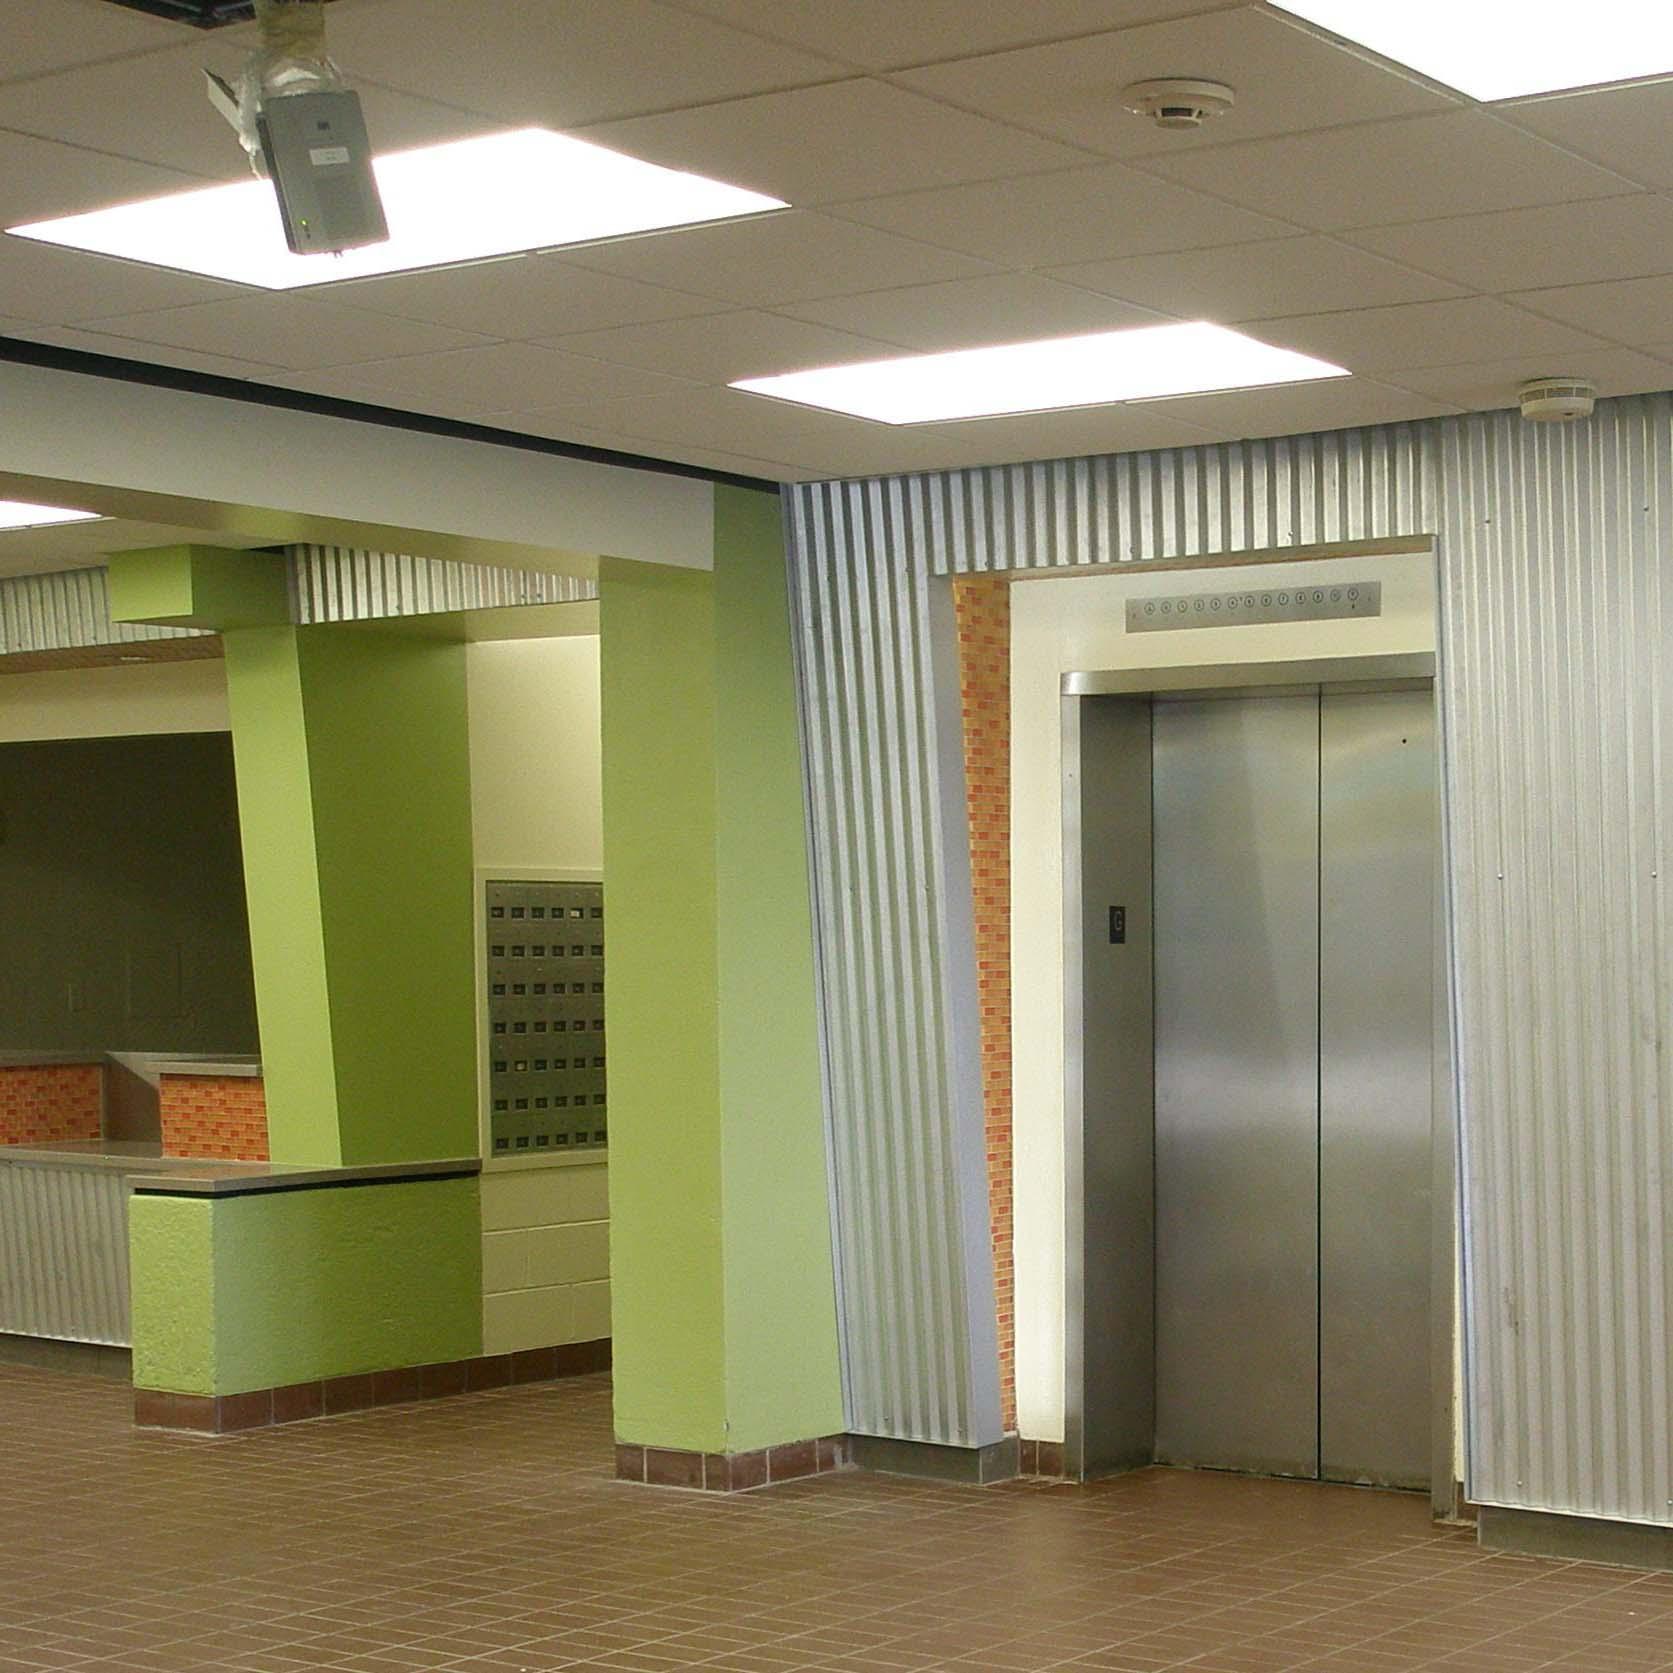 EMU Dorm Elevator Interior Design